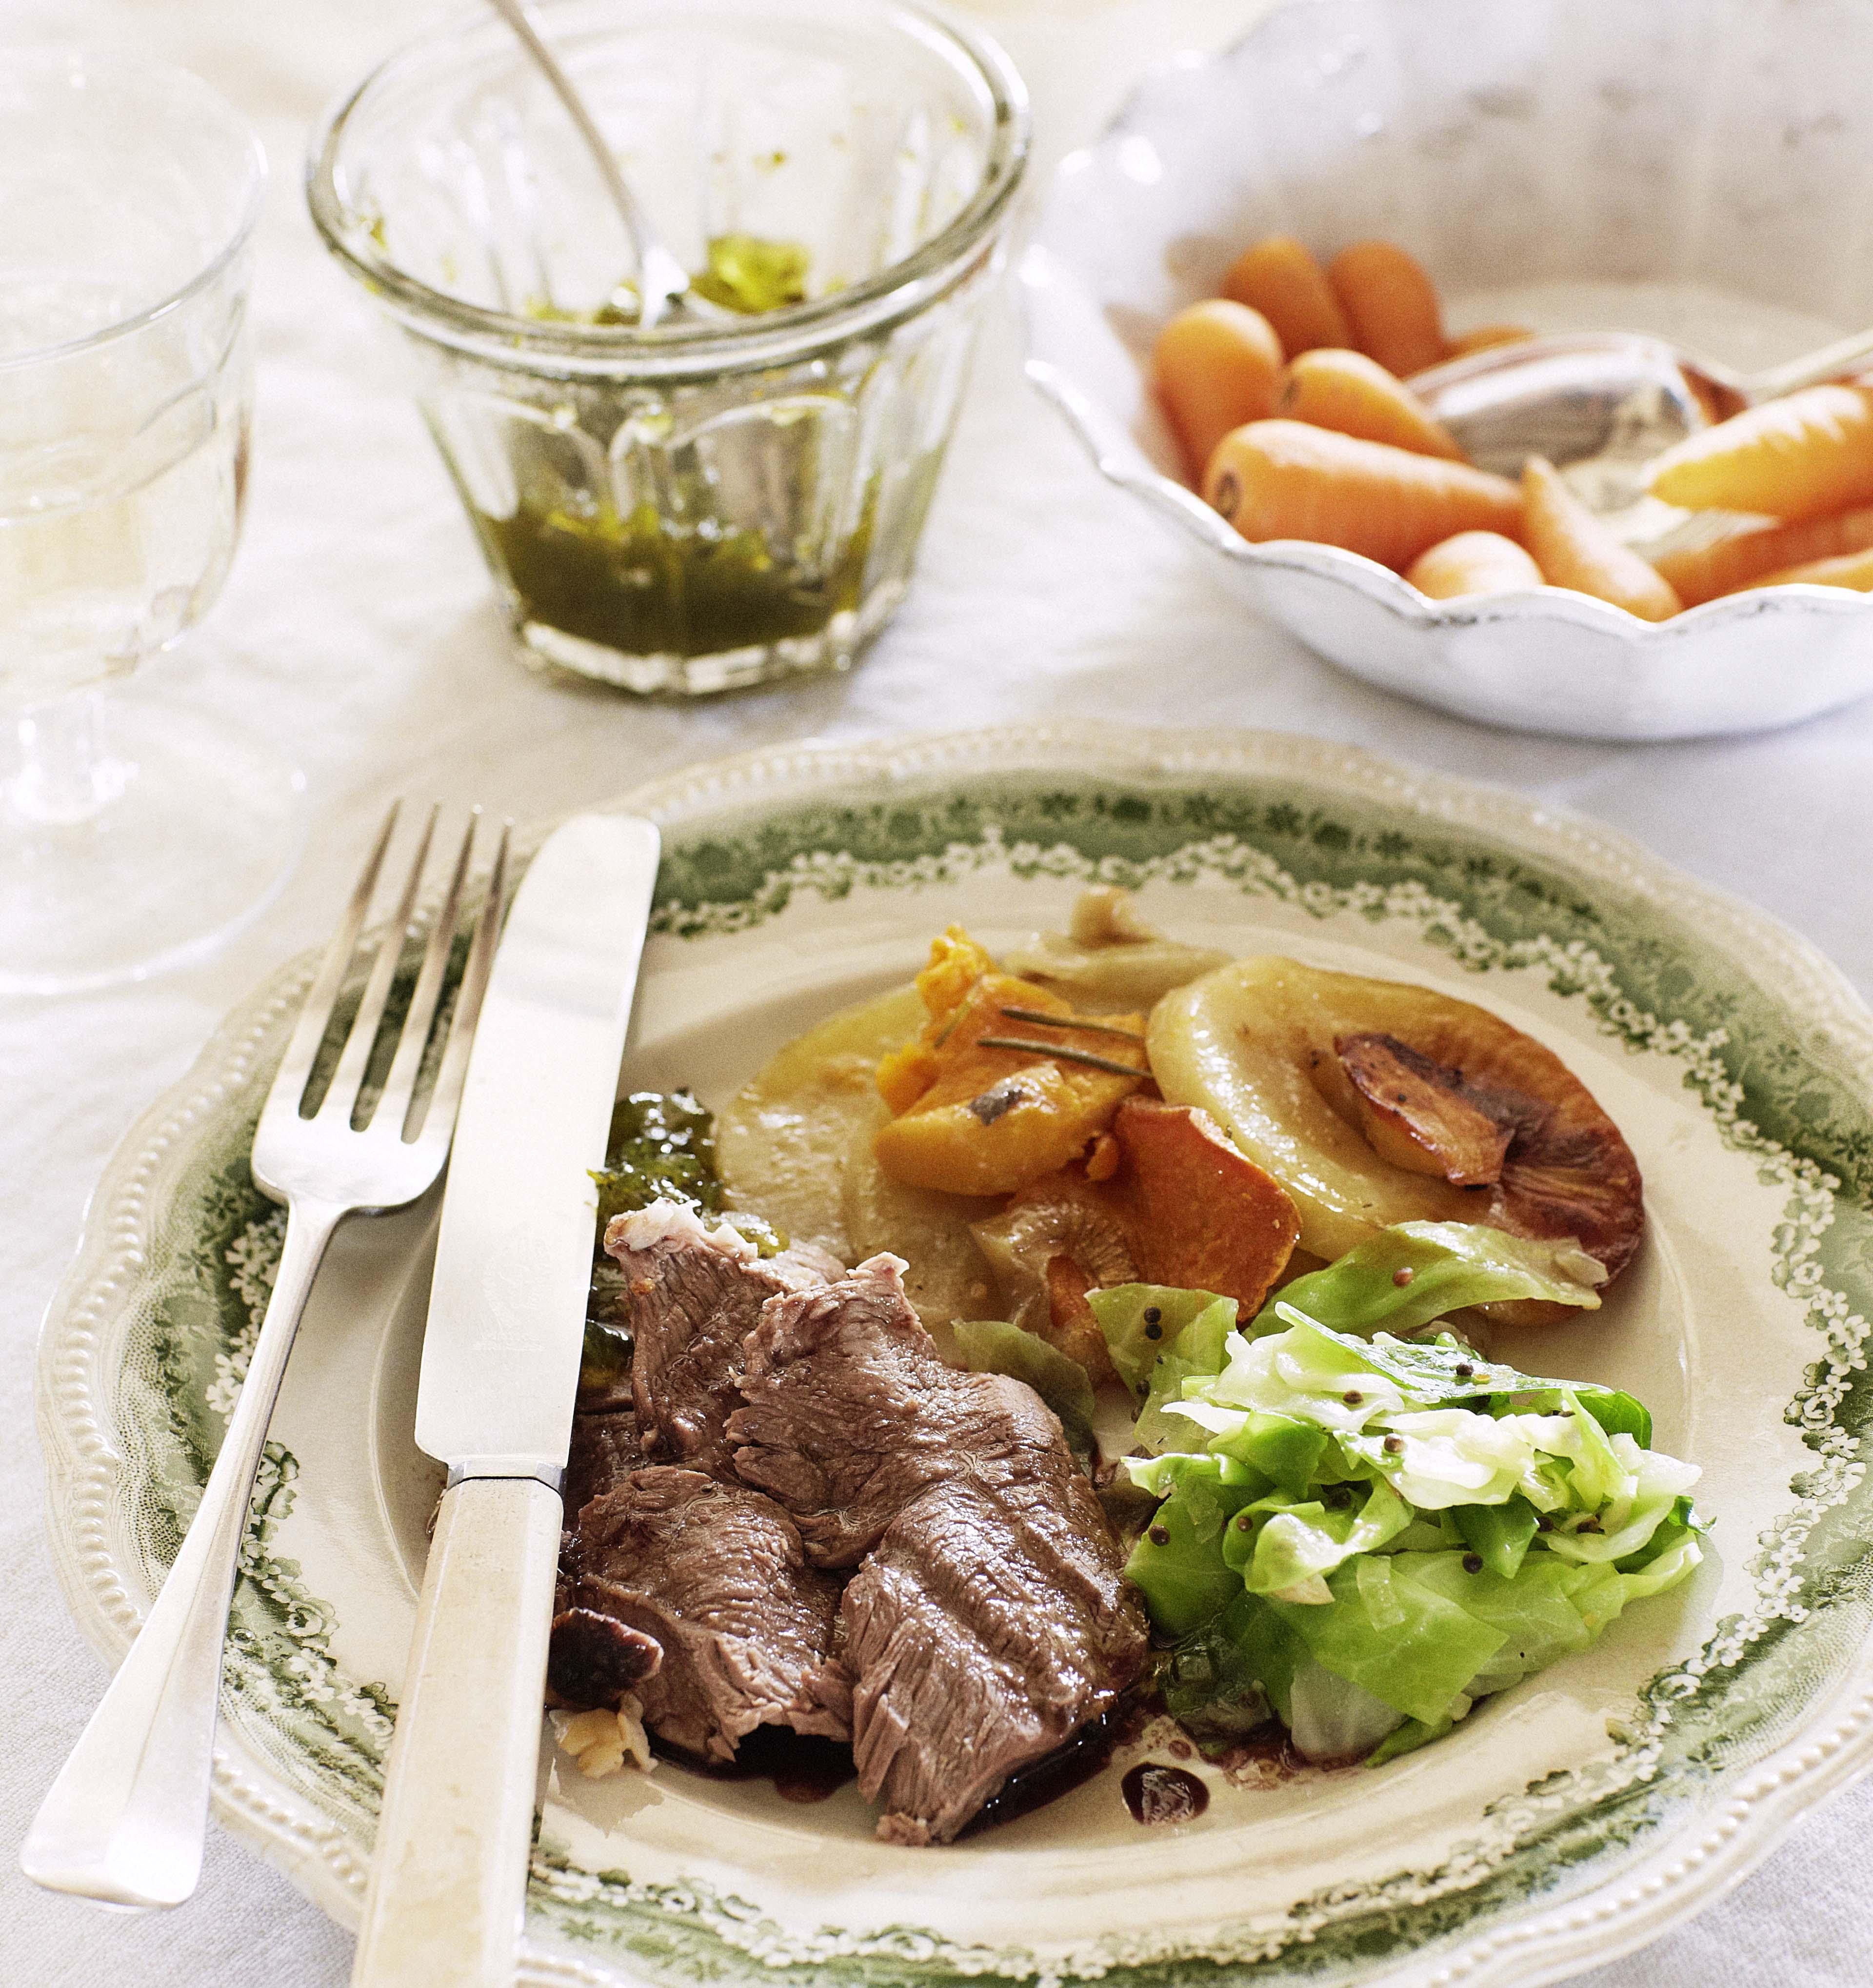 ... herb garlic roast potatoes rosemary garlic roast leg of lamb with red